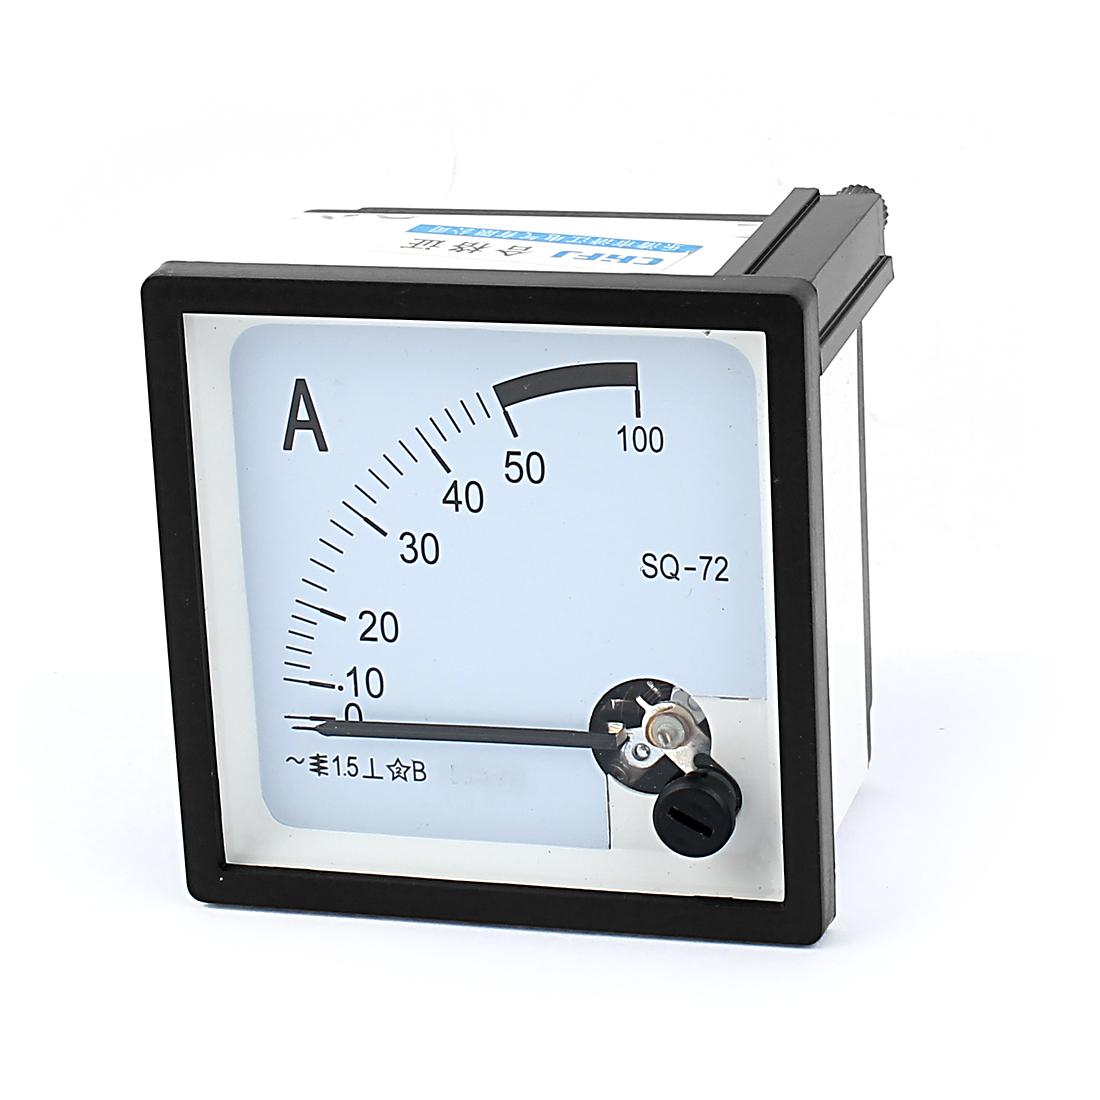 AC 0-50A Analog Ammeter Analogue Panel Ampmeter Current Meter Gauge